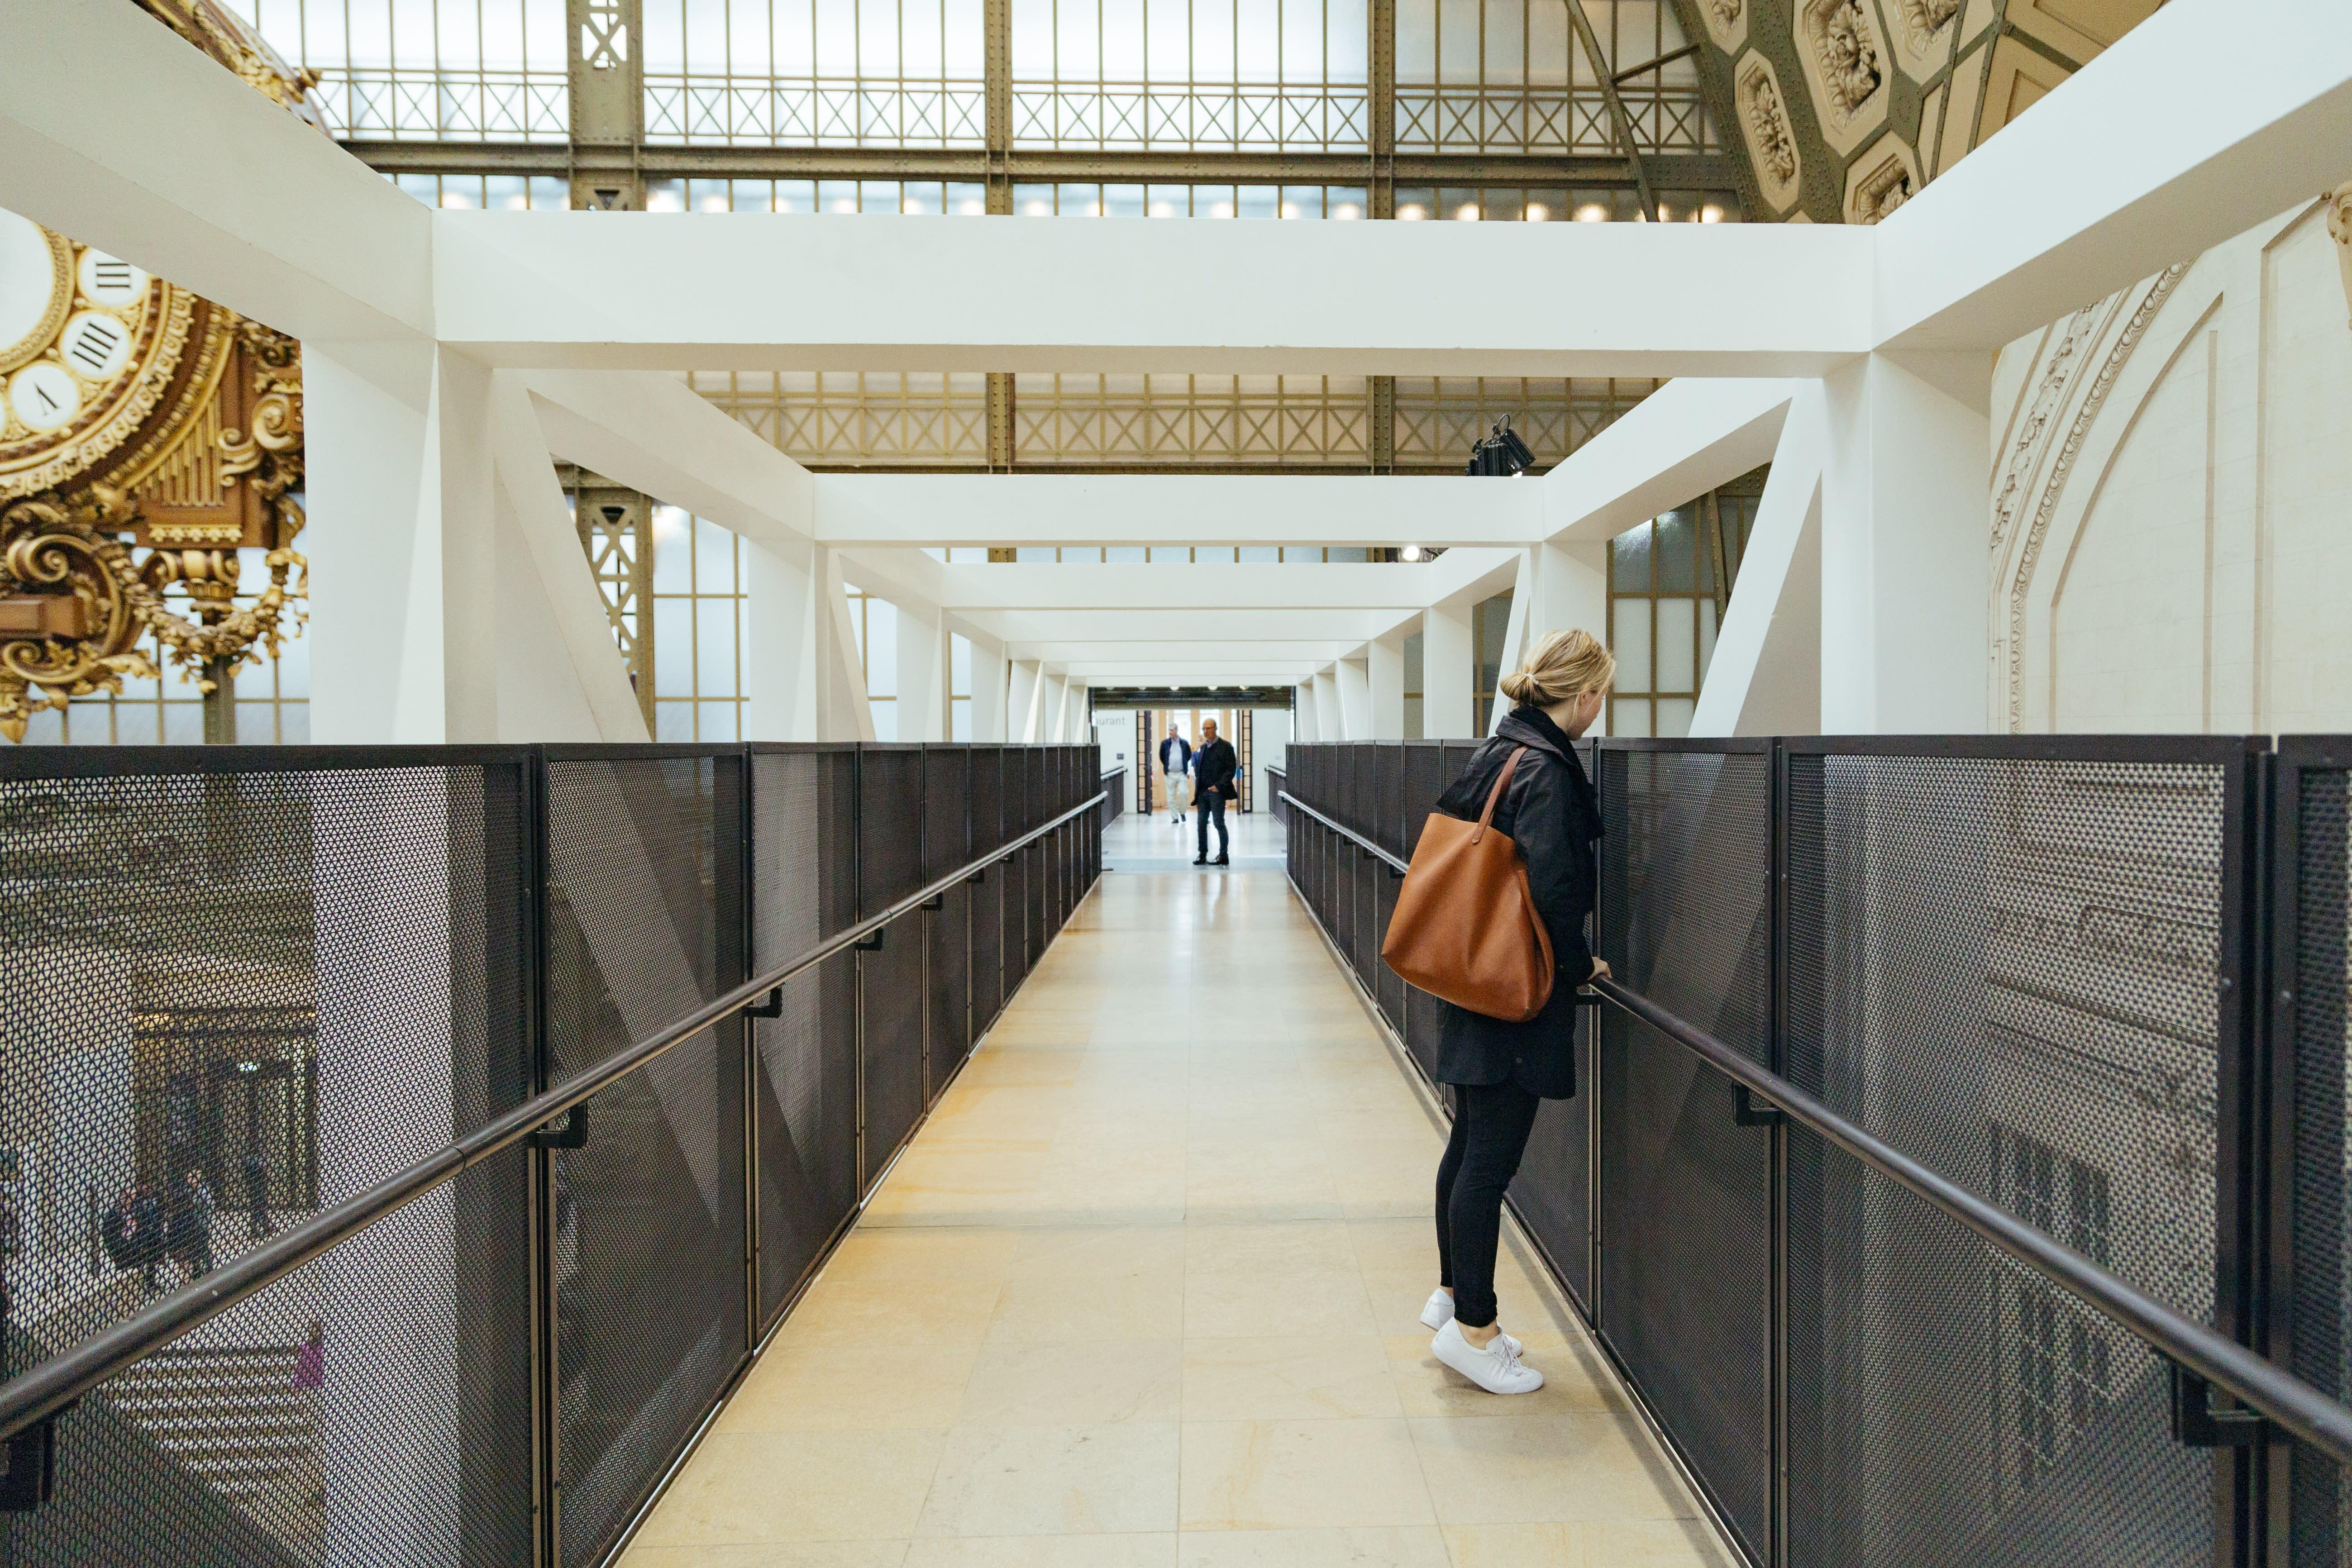 Musée d'Orsay บัตรเข้างาน